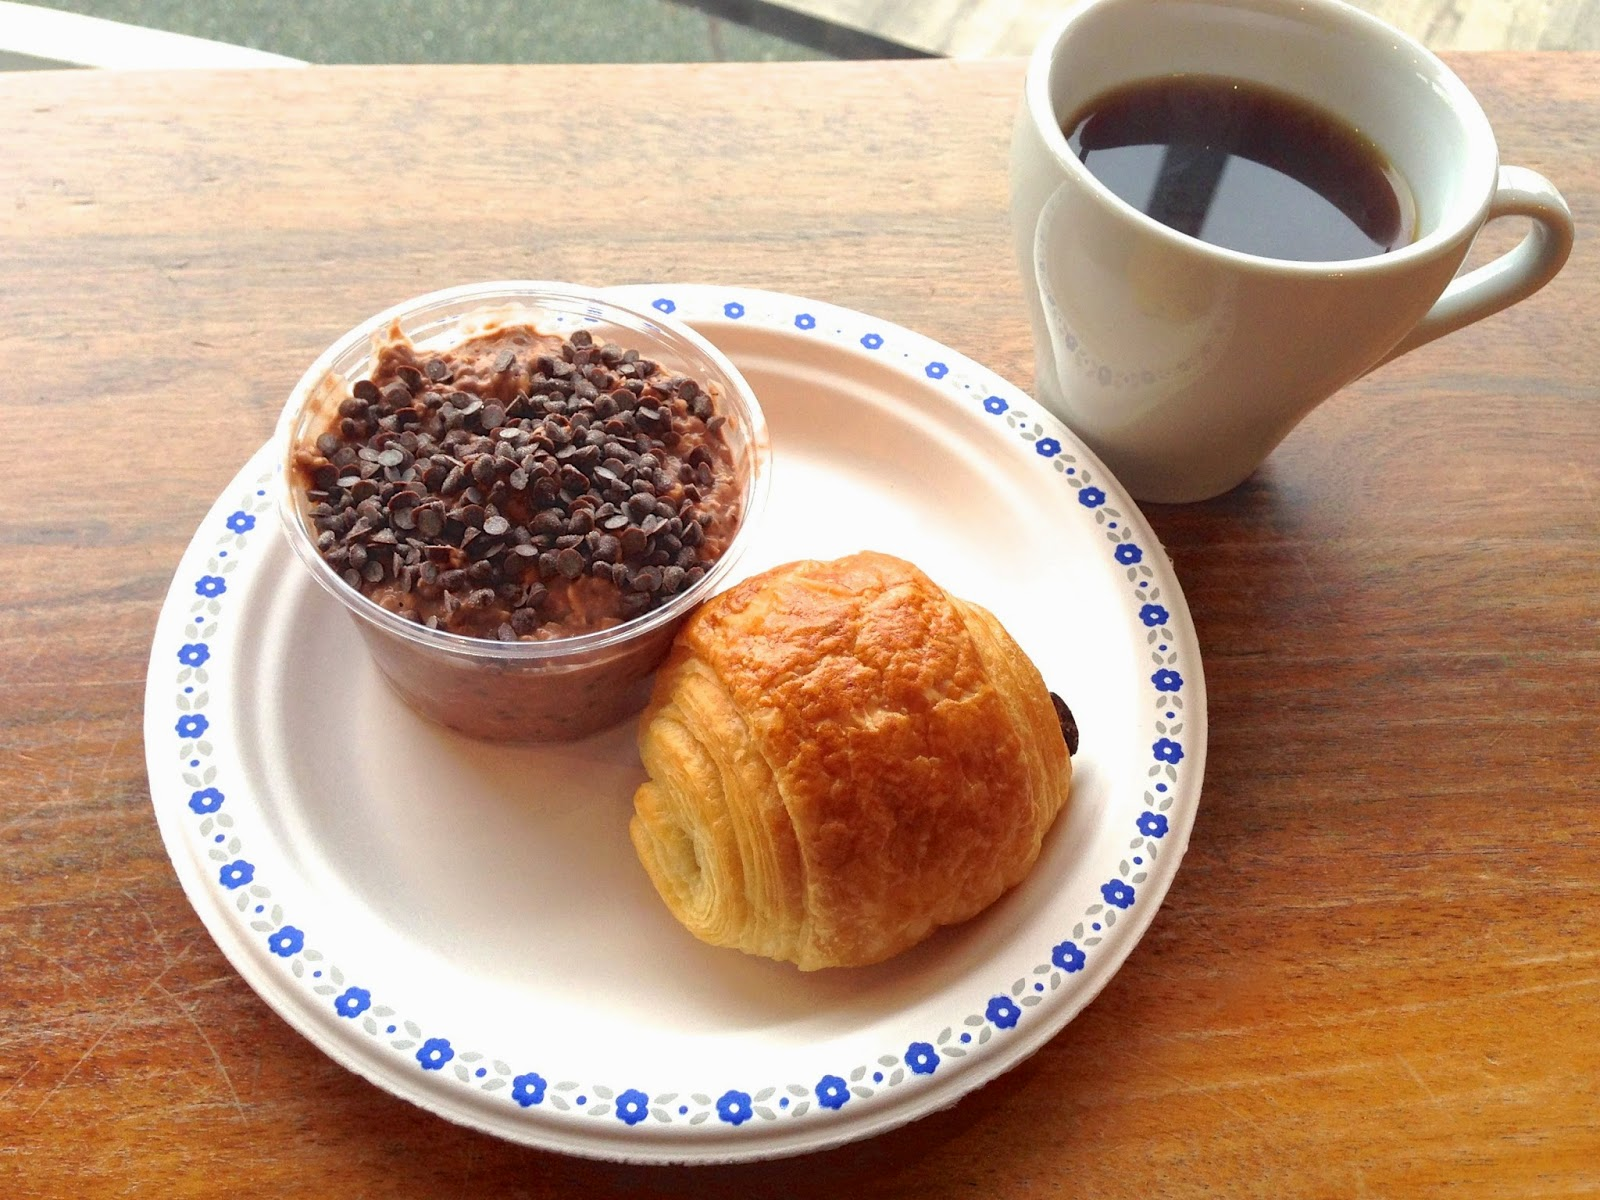 Cold Oats Pain Au Chocolat And Panama Esmeralda Coffee